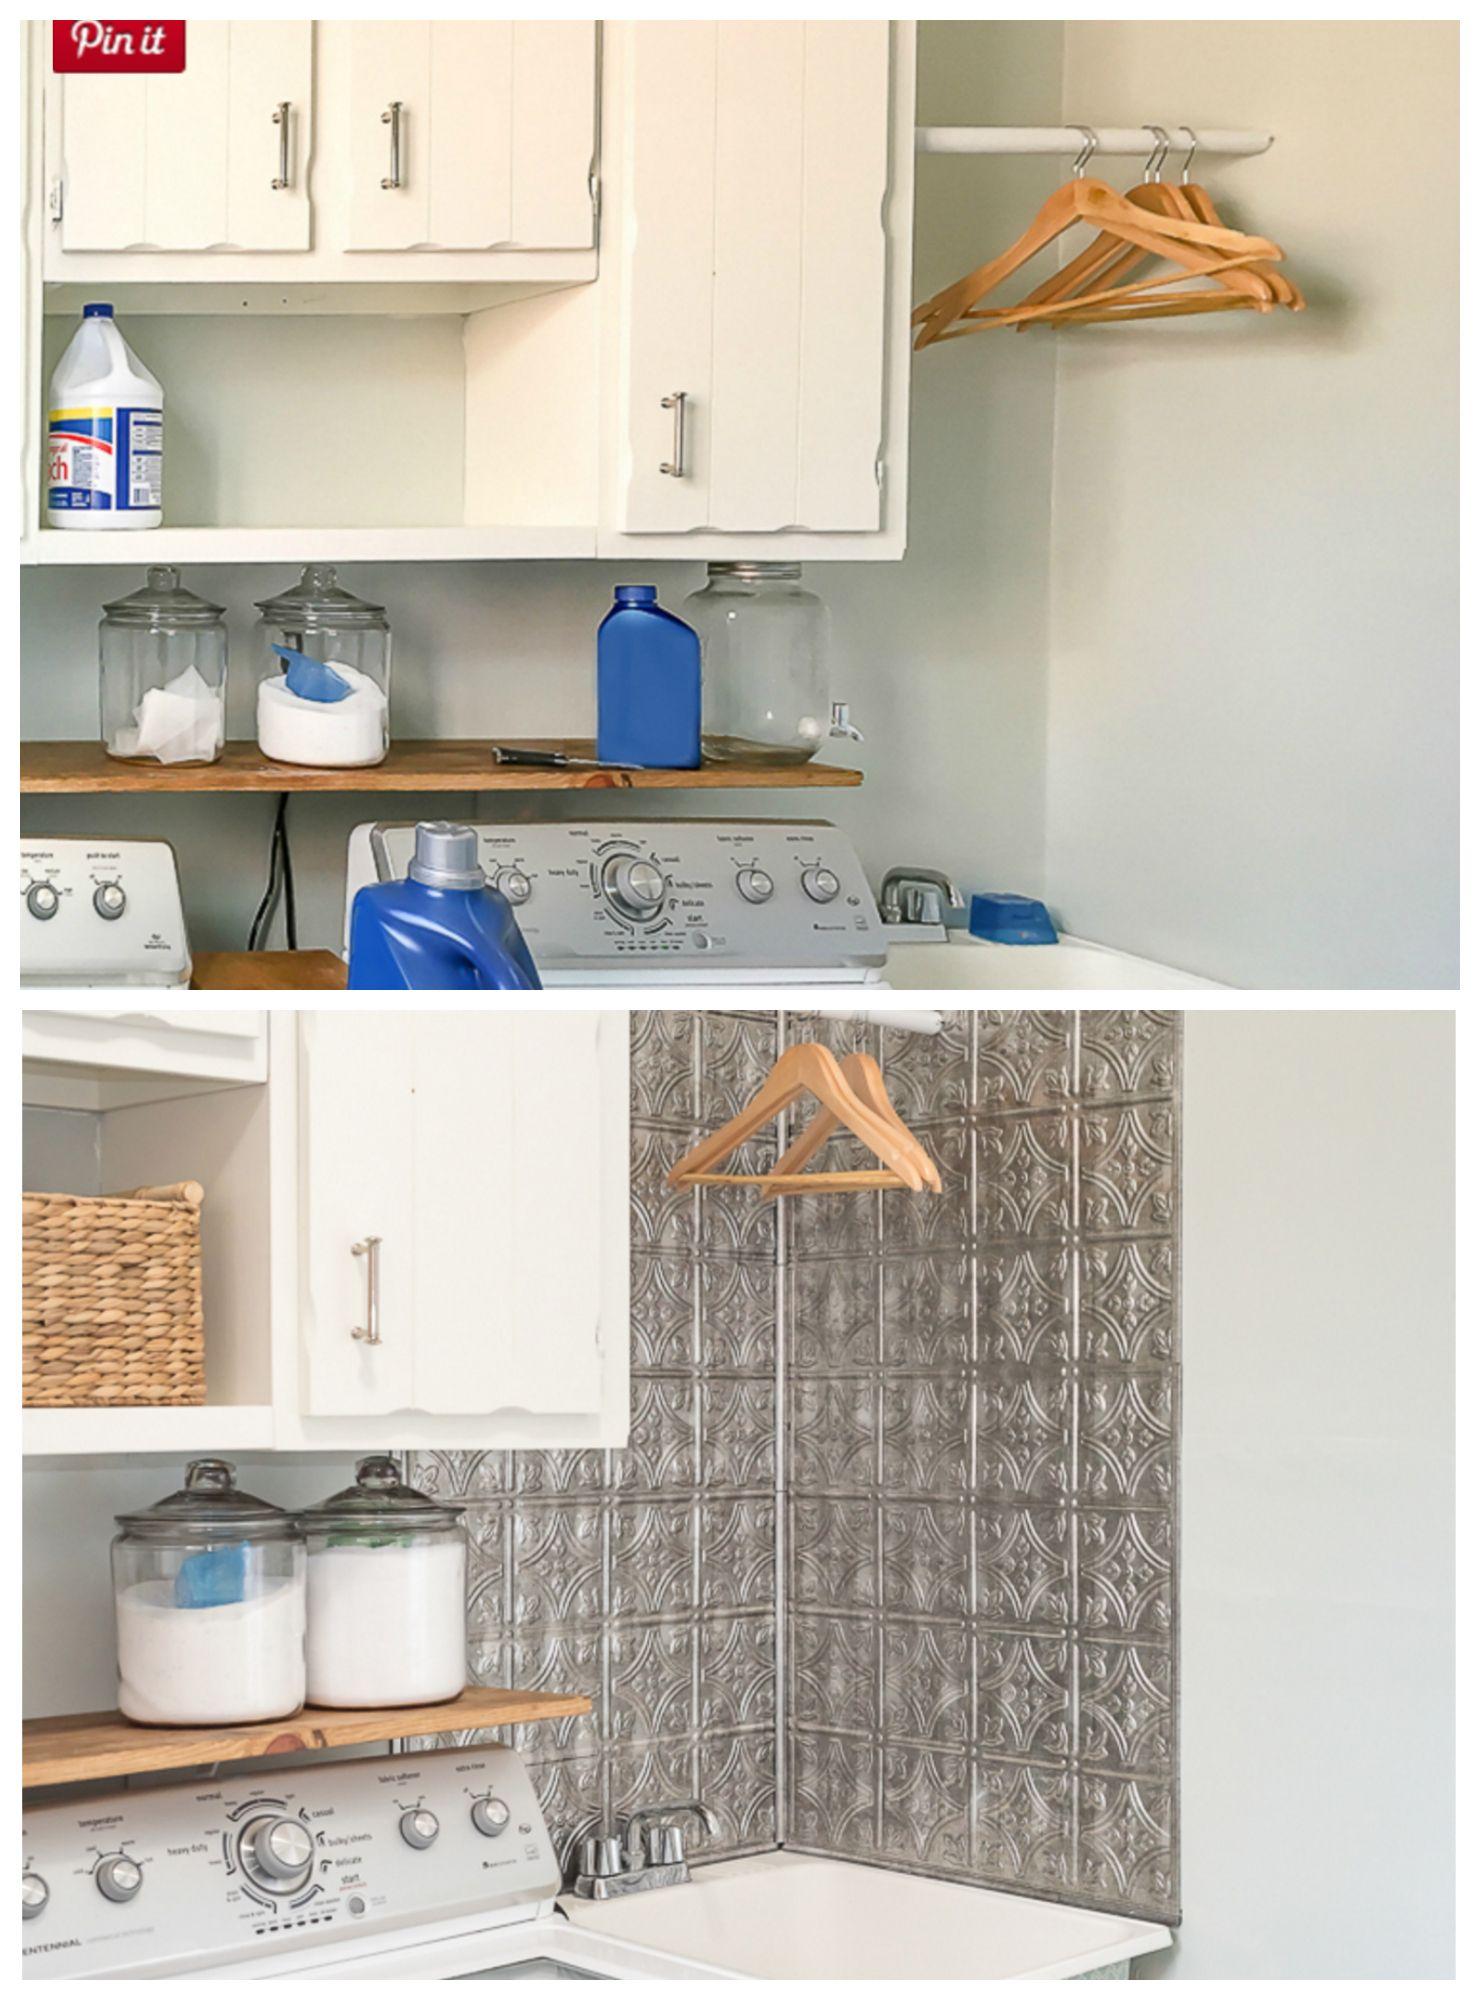 Hassle Free Laundry Room Backsplash Laundry Room Inspiration Laundry Room Decor Diy Kitchen Countertops